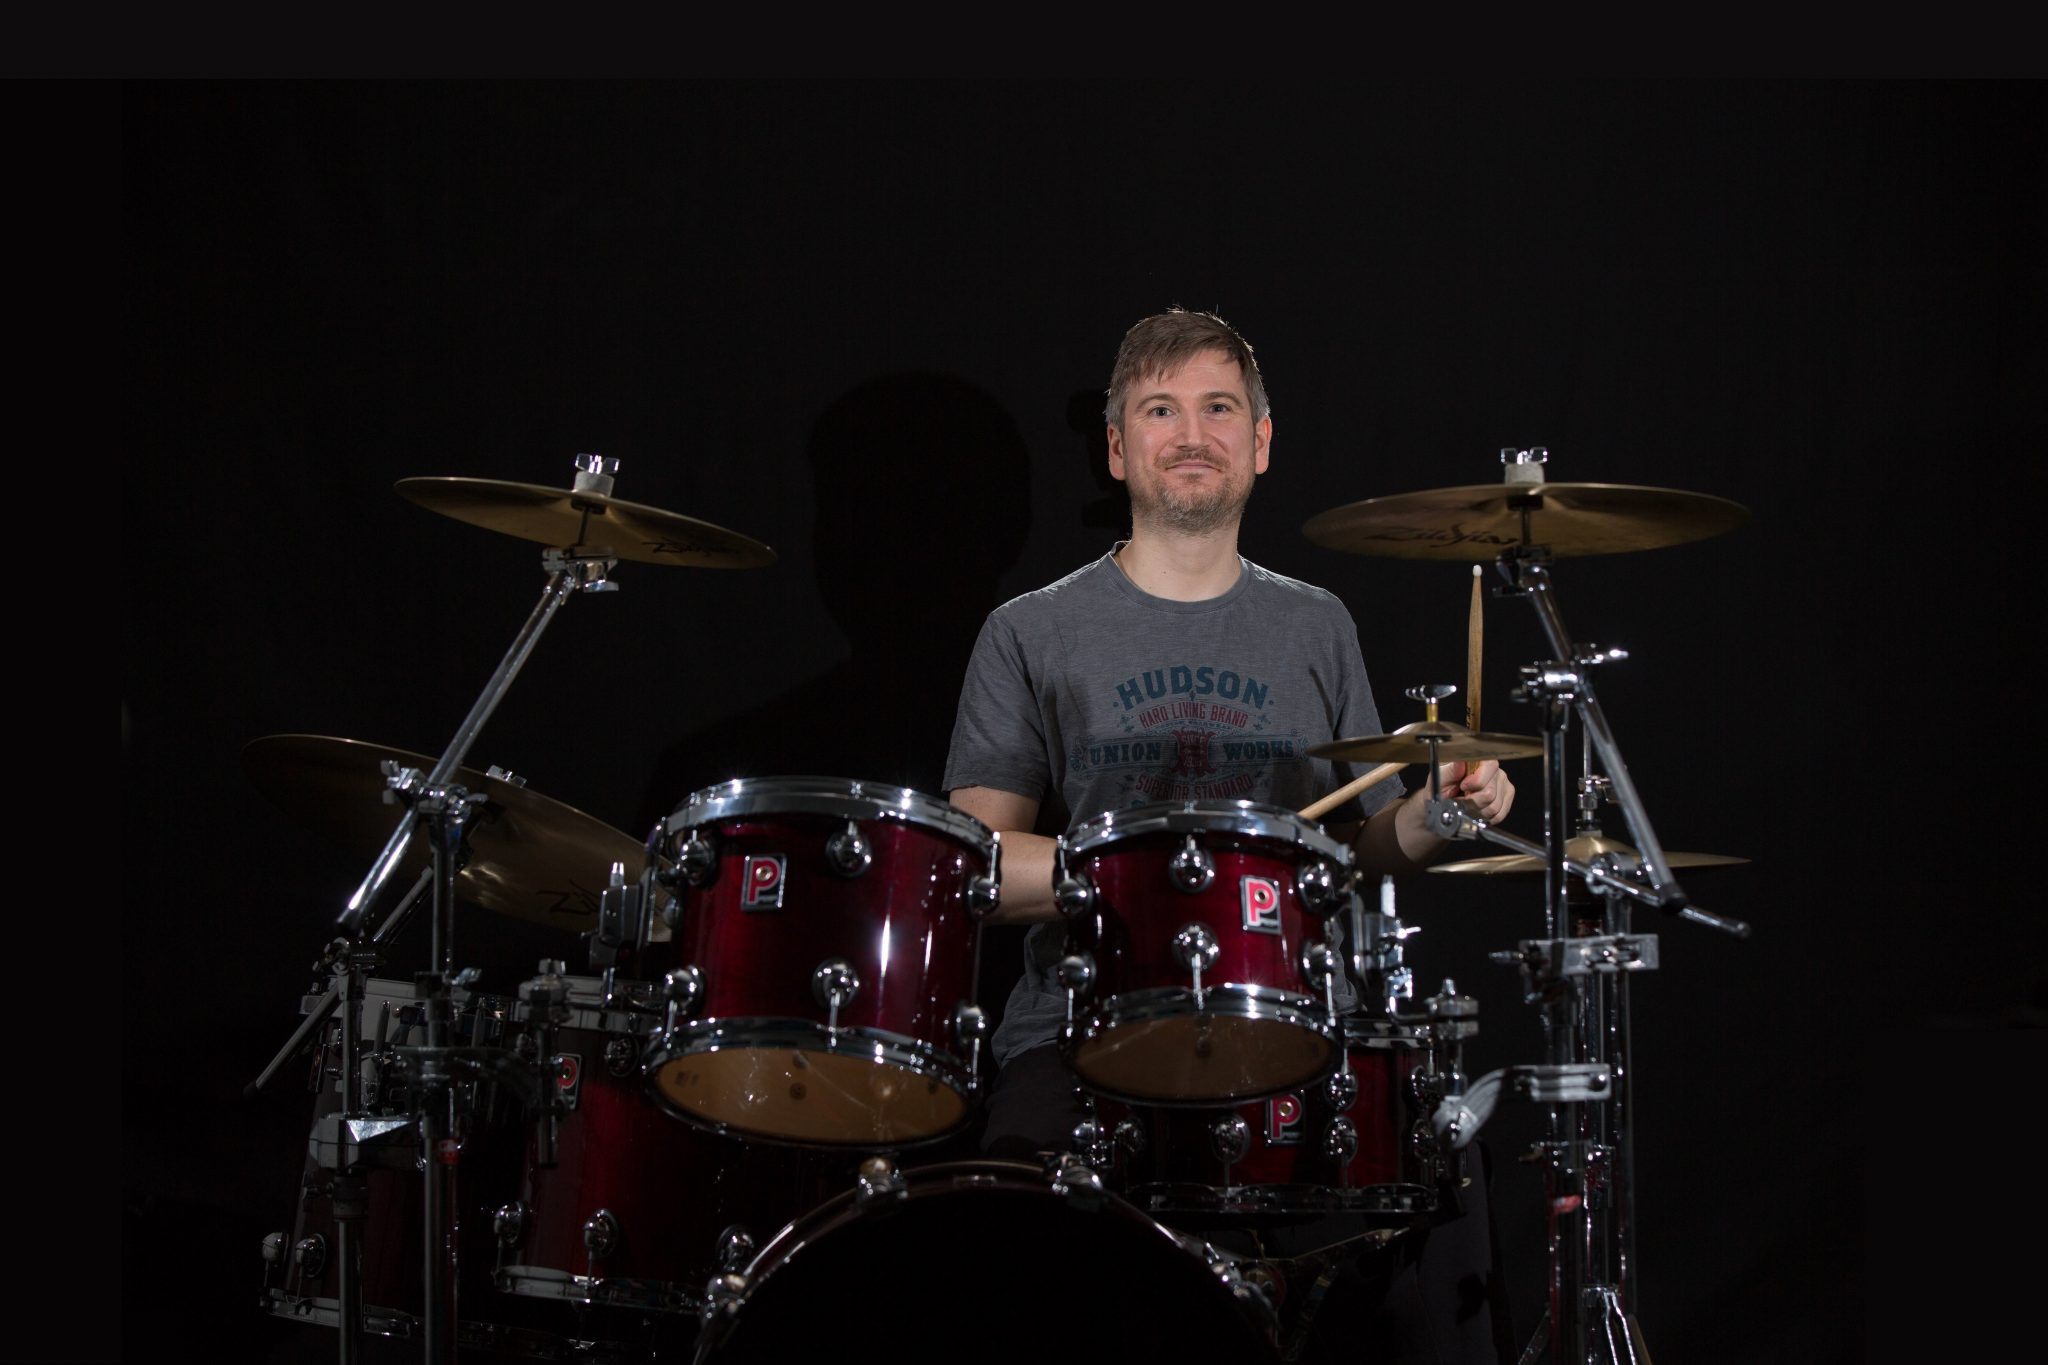 Drum Teacher Matthew Johns playing a Premier Genista drumkit.